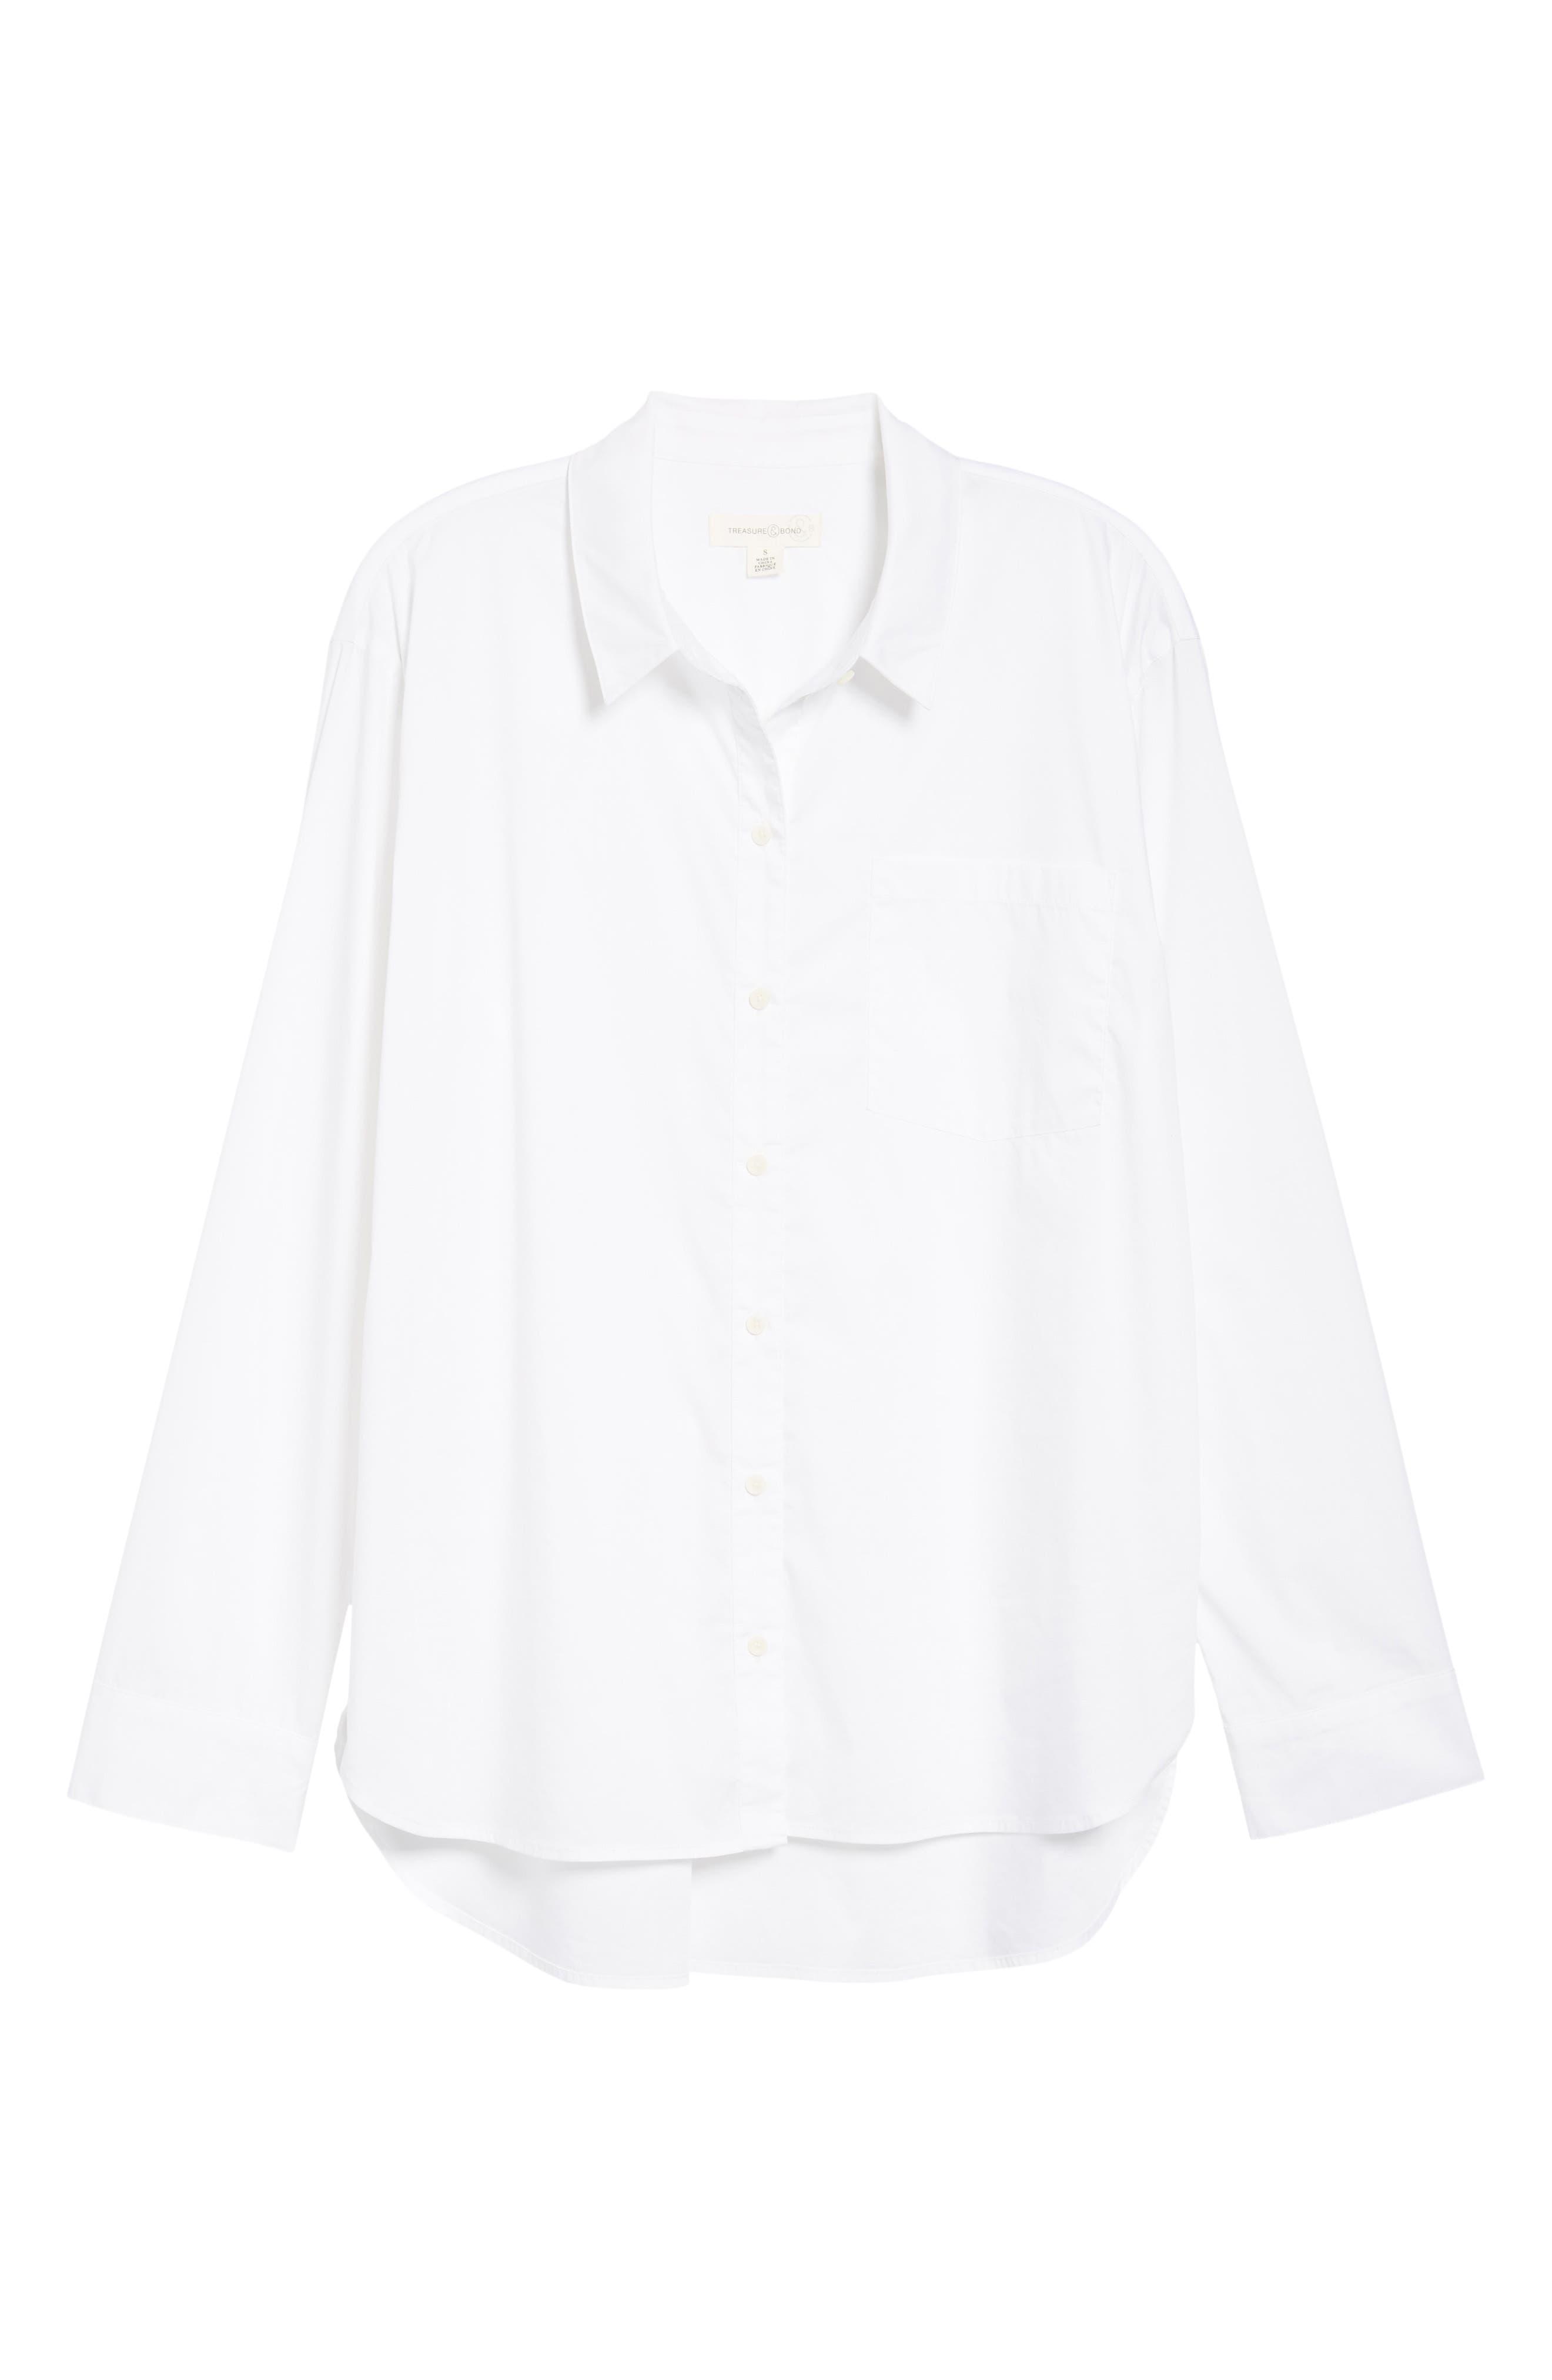 Oversize Shirt,                             Alternate thumbnail 6, color,                             100